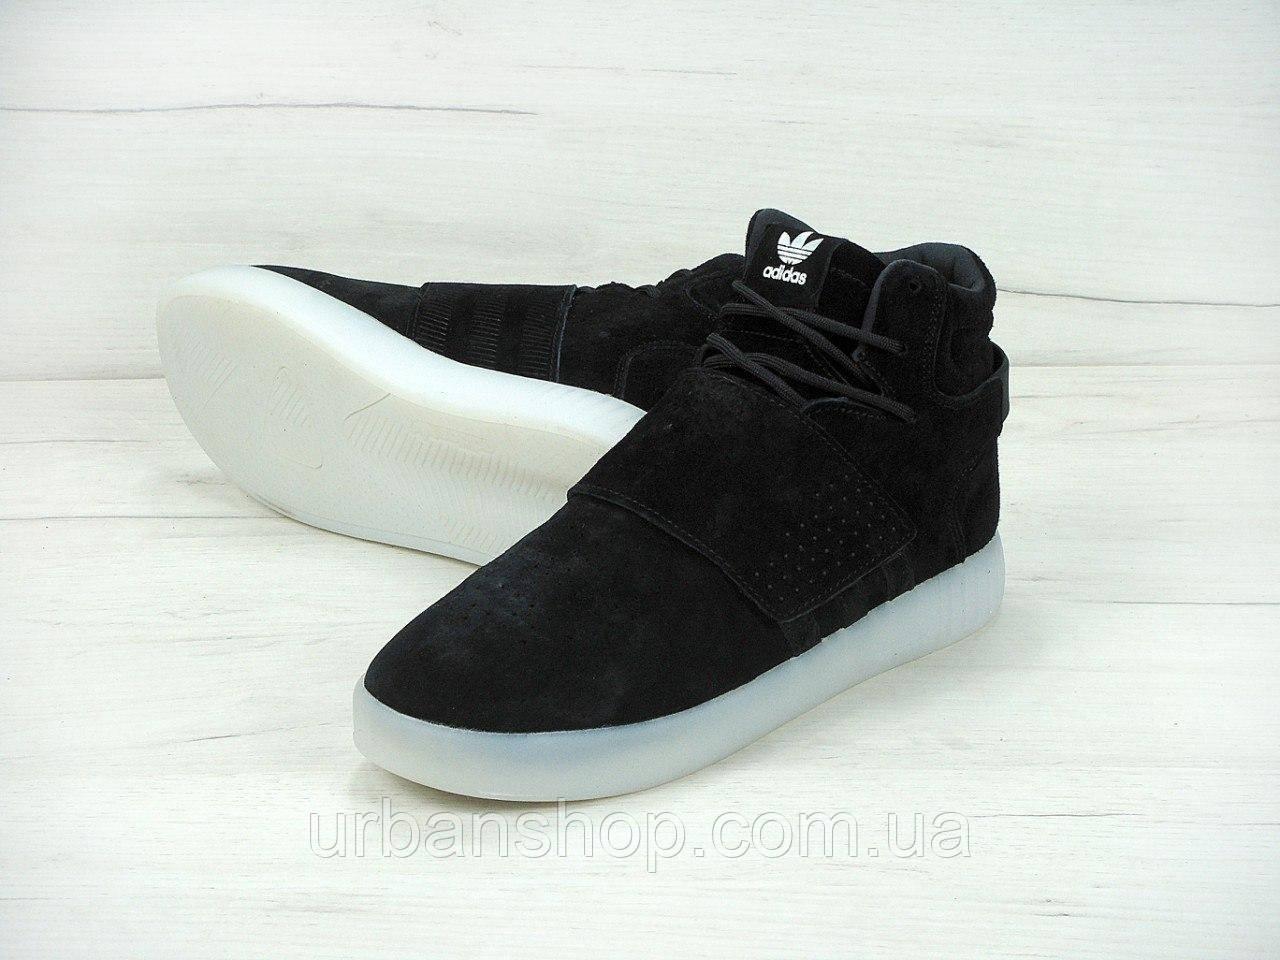 ... Мужские кроссовки Adidas Tubular Invader Strap Shoes Black Ice White 979bd7e15